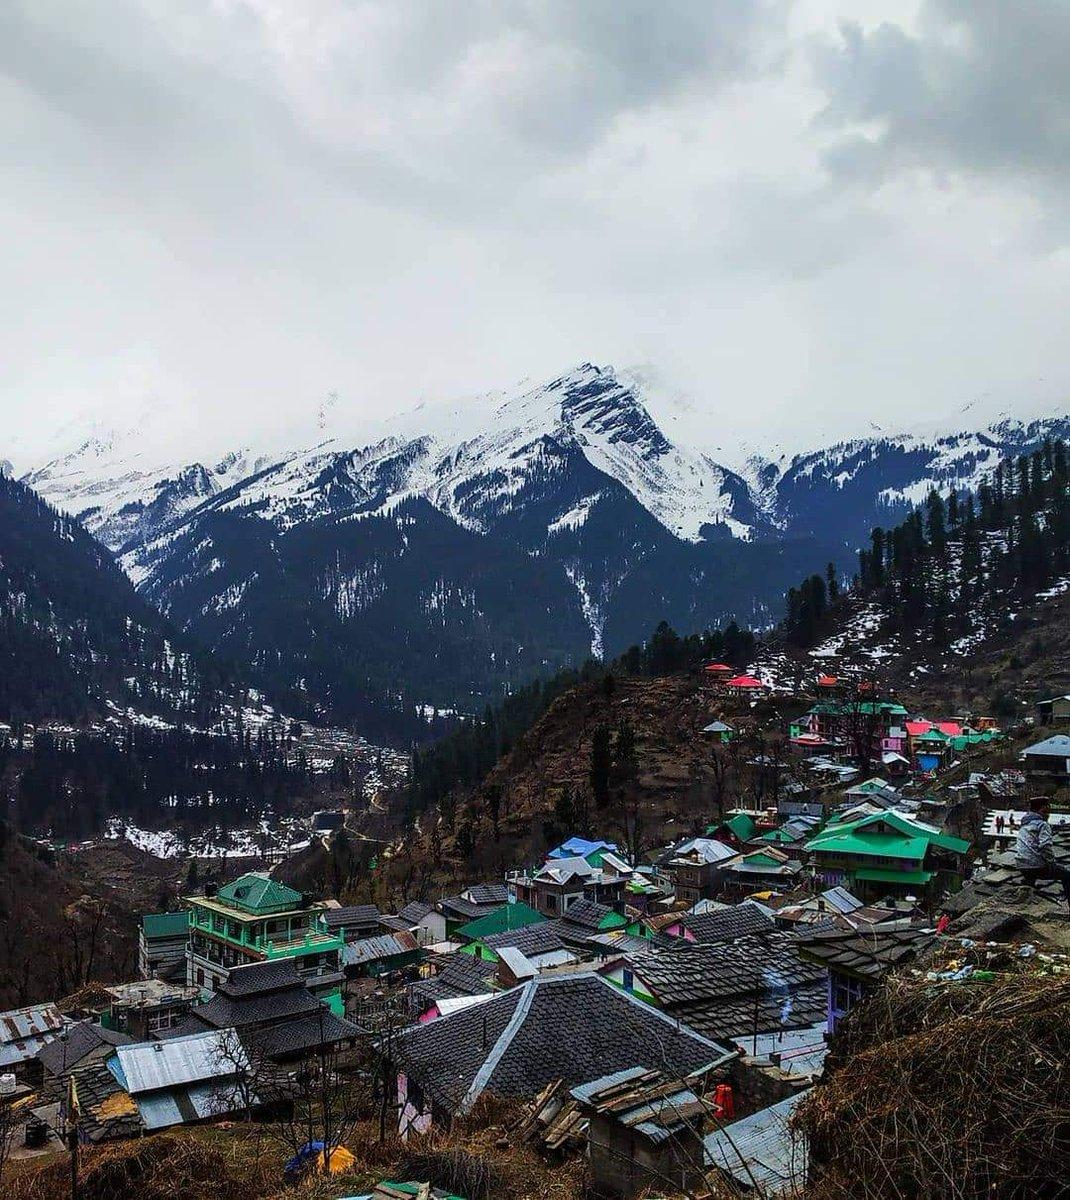 Tosh ☮️ Parvati Valley ♥️ .   #redminote5prophotography #indiaclicks #indiaclicks #indianphotography #indiapictures #photojournalistravi #theuncommonbox #india_gram #_soi #_woi #desi_diaries #photofie #official_photographers_hub #tosh  #HimachalPradesh